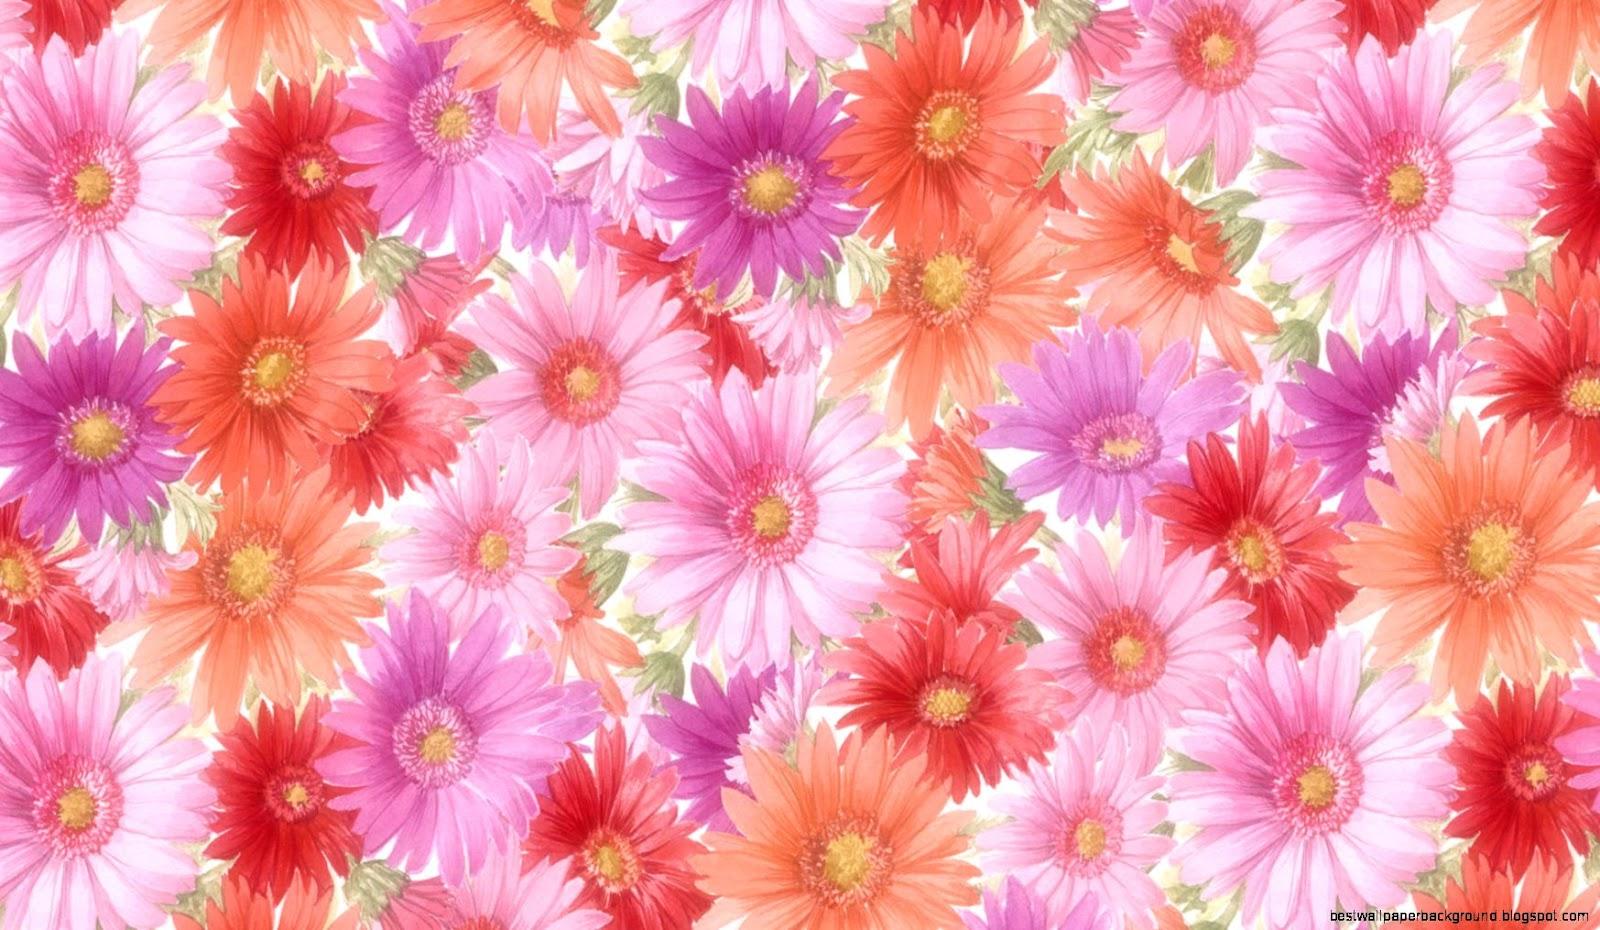 Wallpaper desktop flowers best wallpaper background view original size mightylinksfo